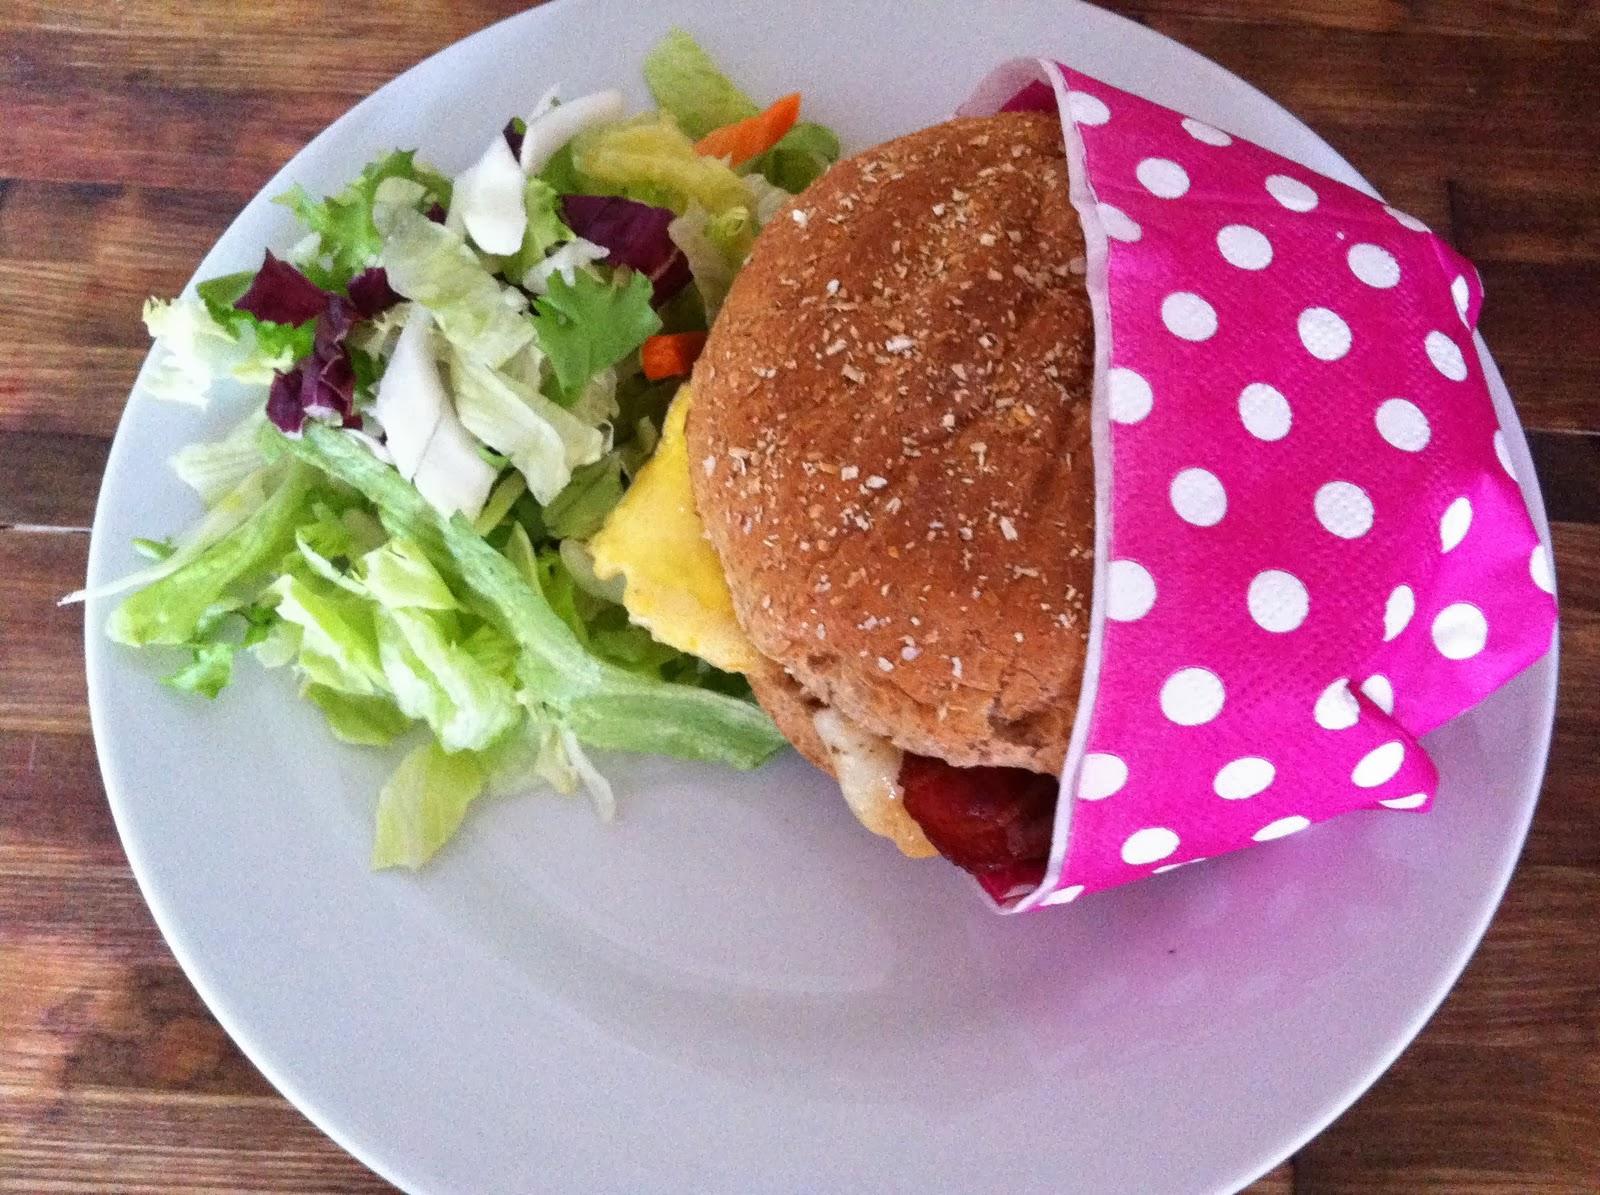 Bacon 'n' egg sandwich